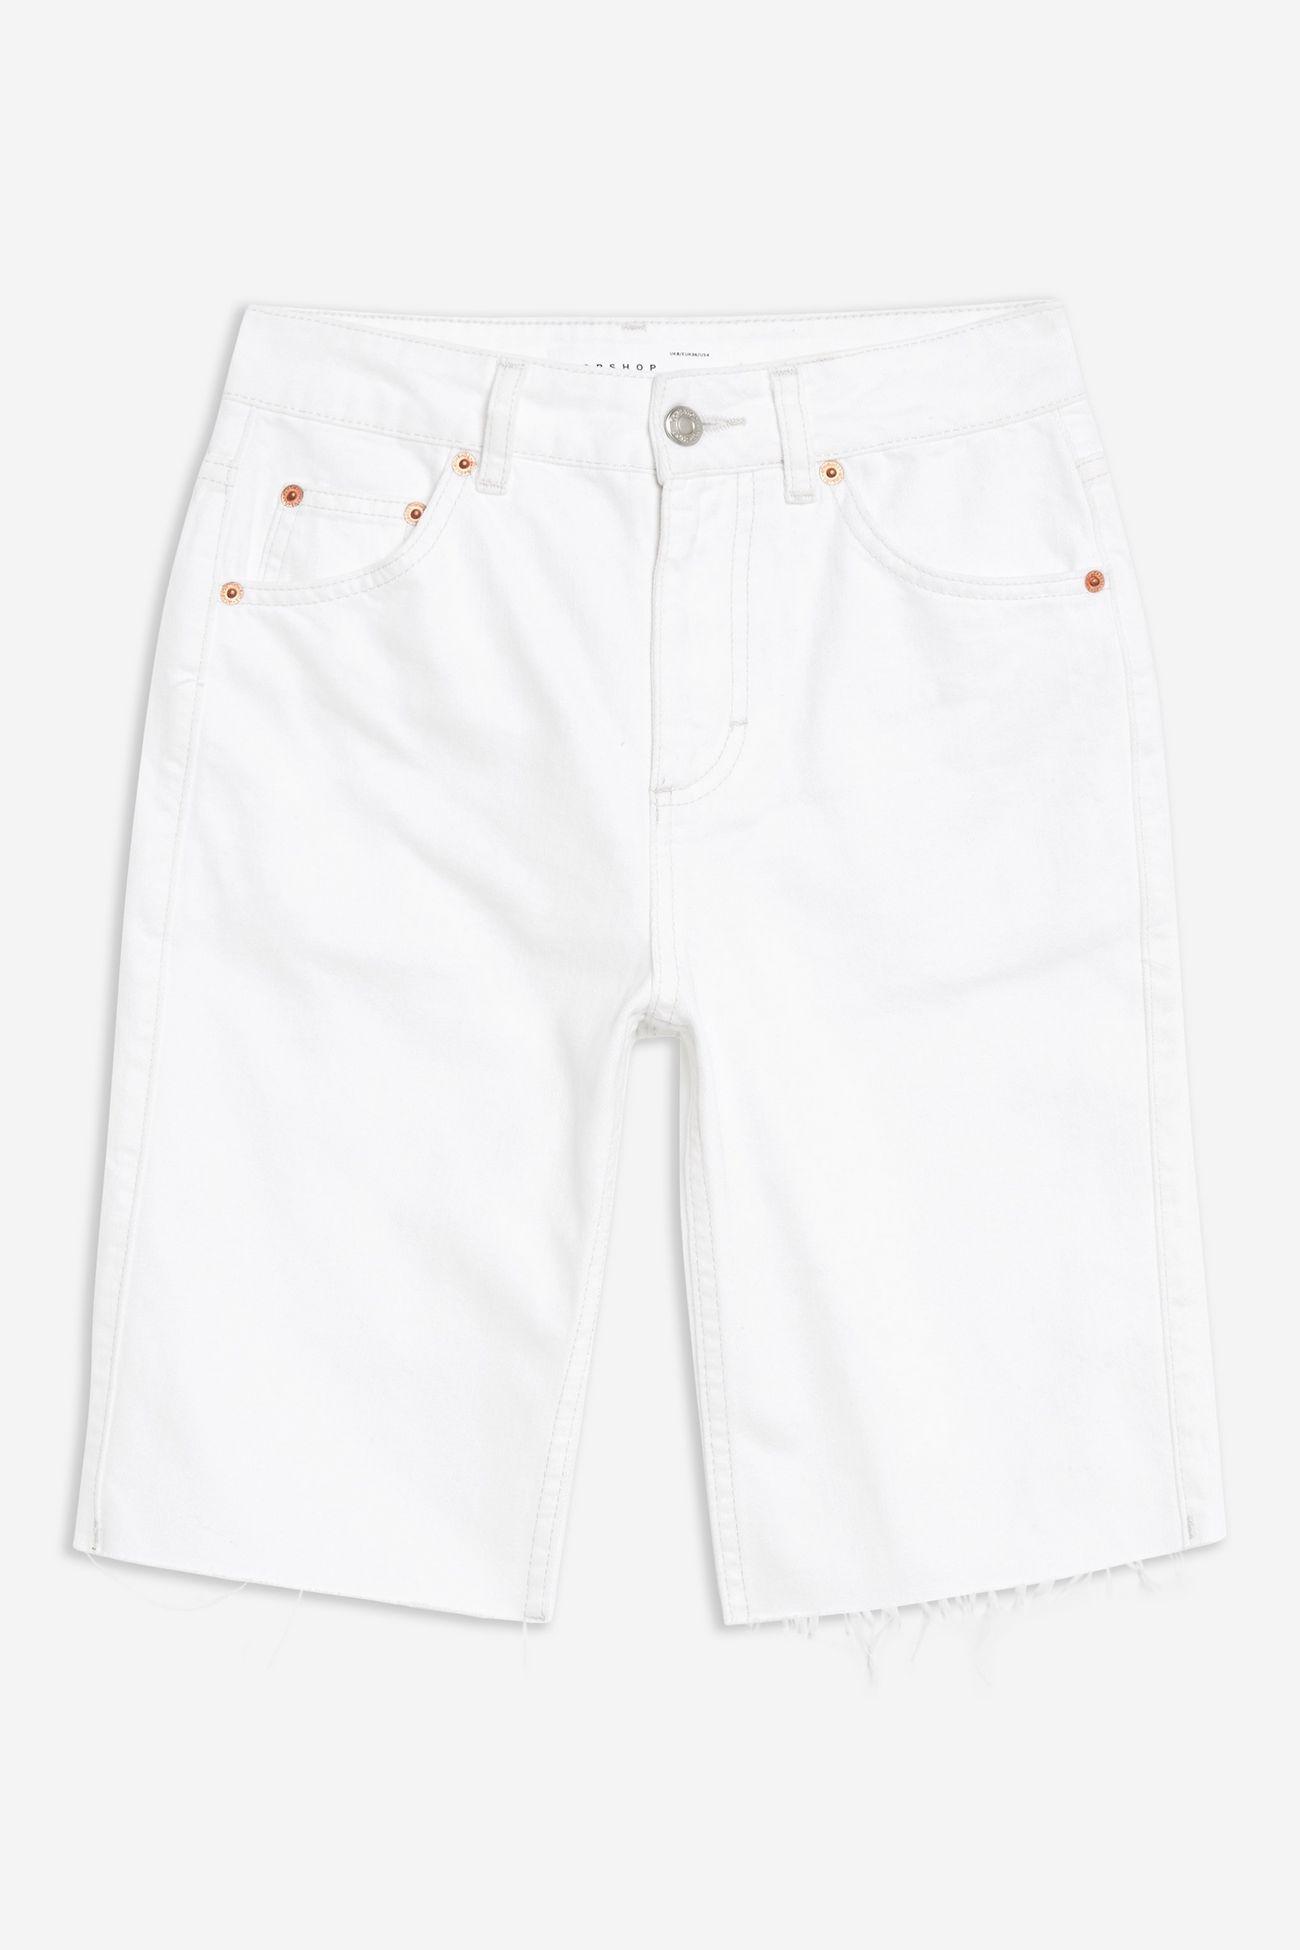 White Cycle Shorts